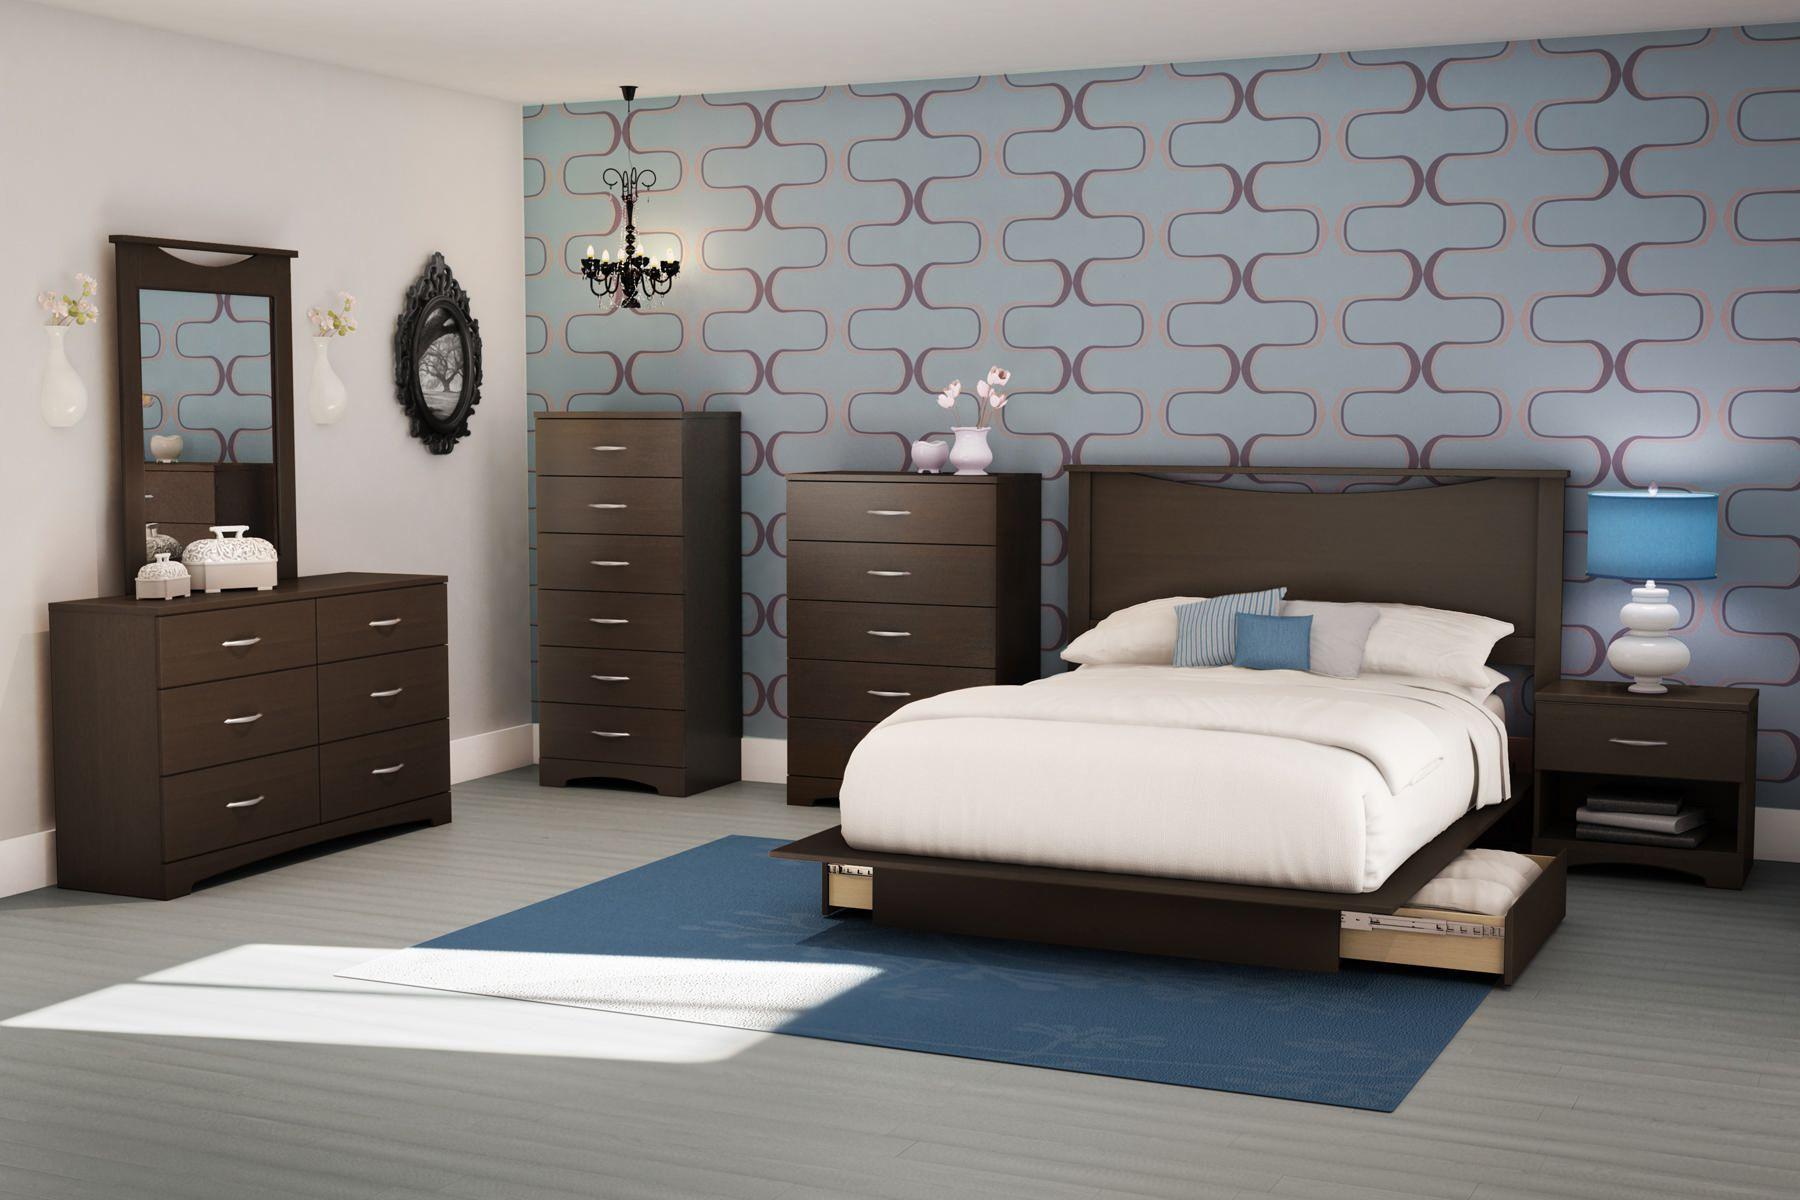 soho at bed furniture brownstone south shore set noel bedroo bedroom